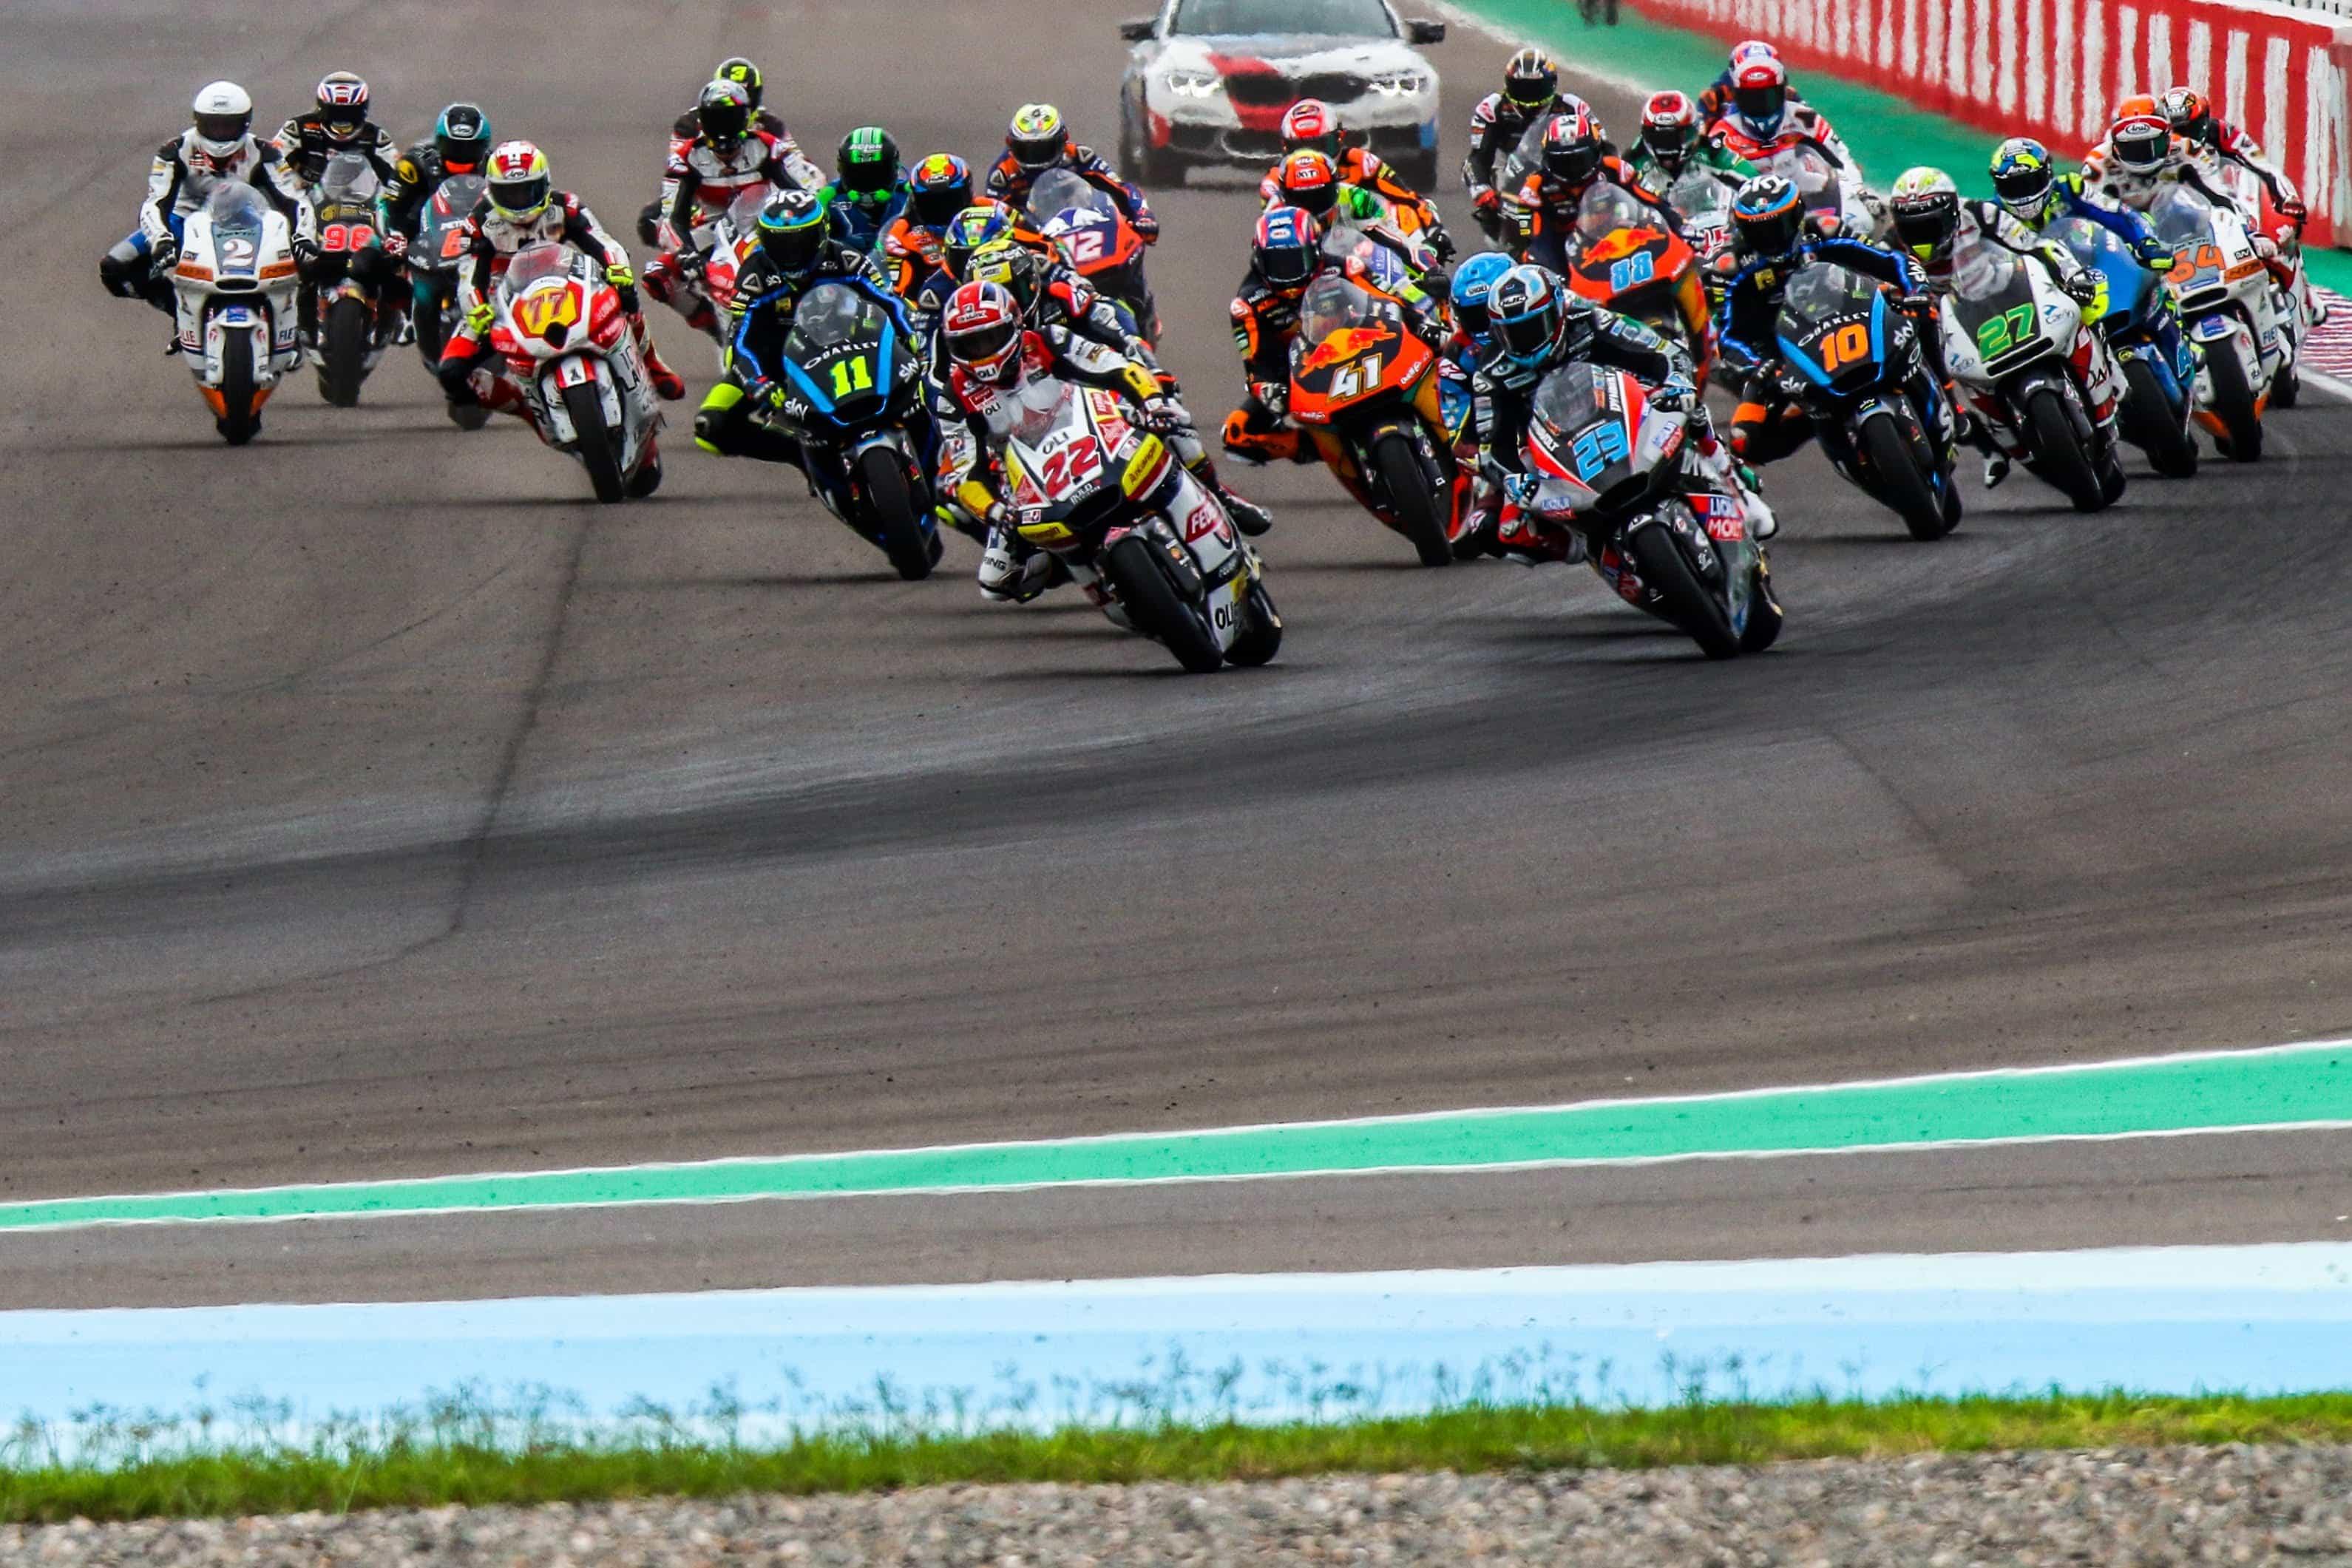 【NTS RW RACING GP】FIM MotoGP世界グランプリMoto2第二戦 アルゼンチンGP 決勝レース